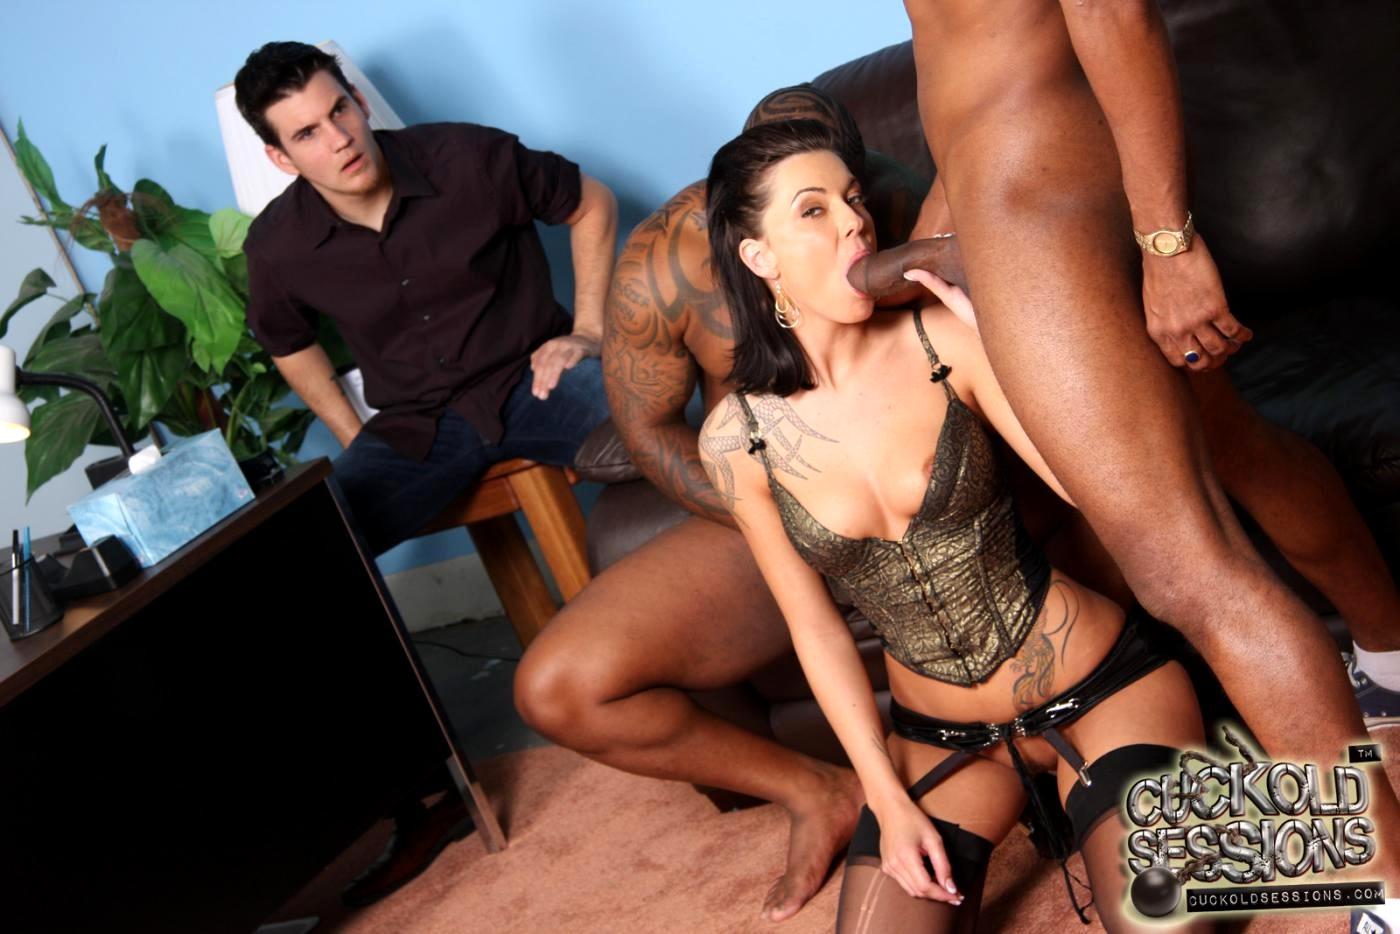 Жена богатого мужа фильм порно